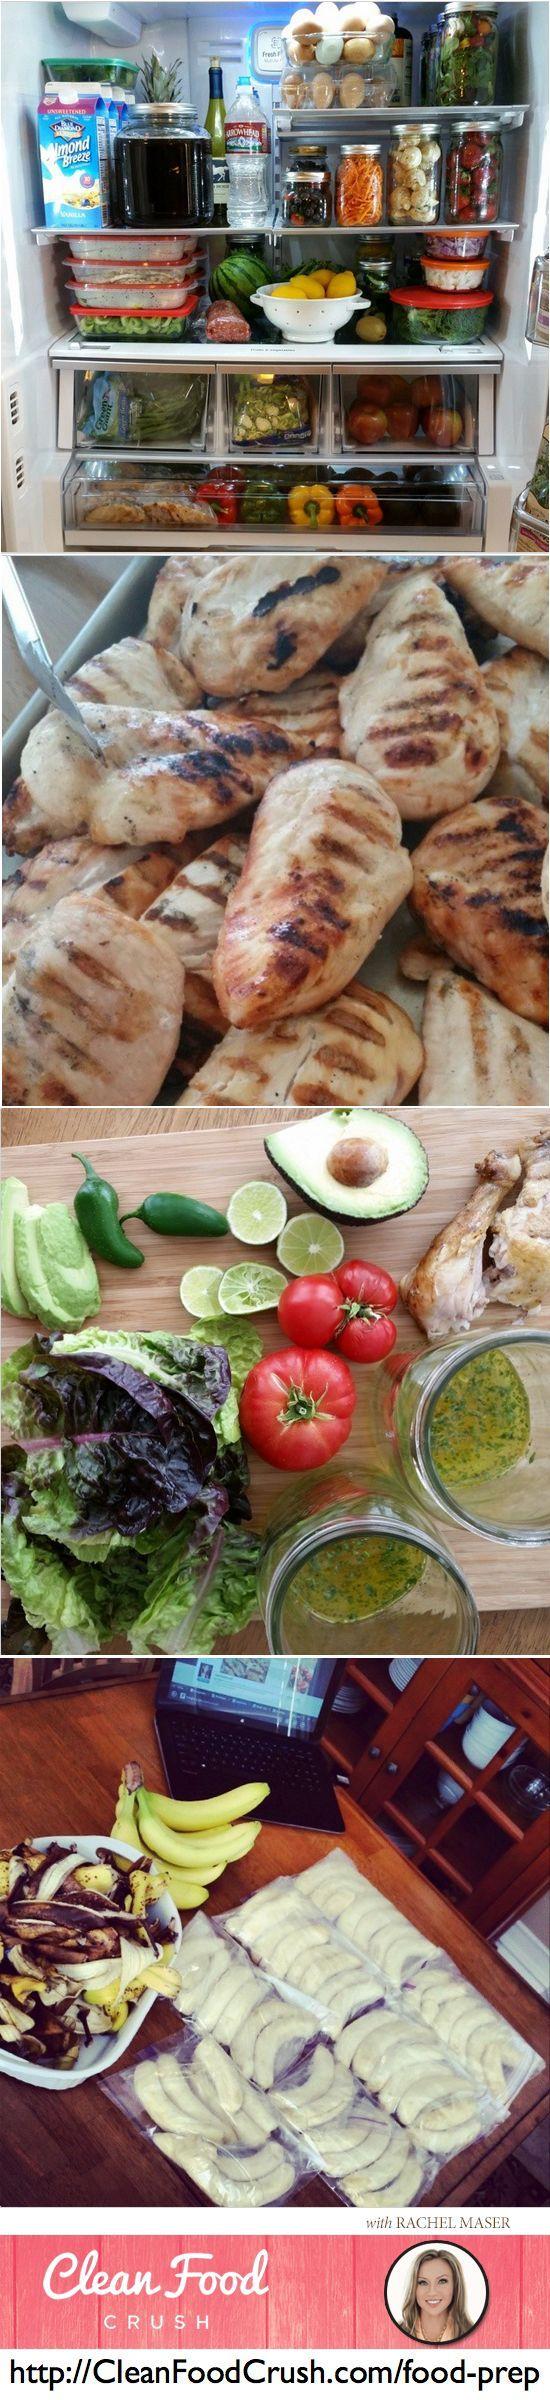 Food Prep Sunday – How to do weekly food and fridge preparation. #foodprep